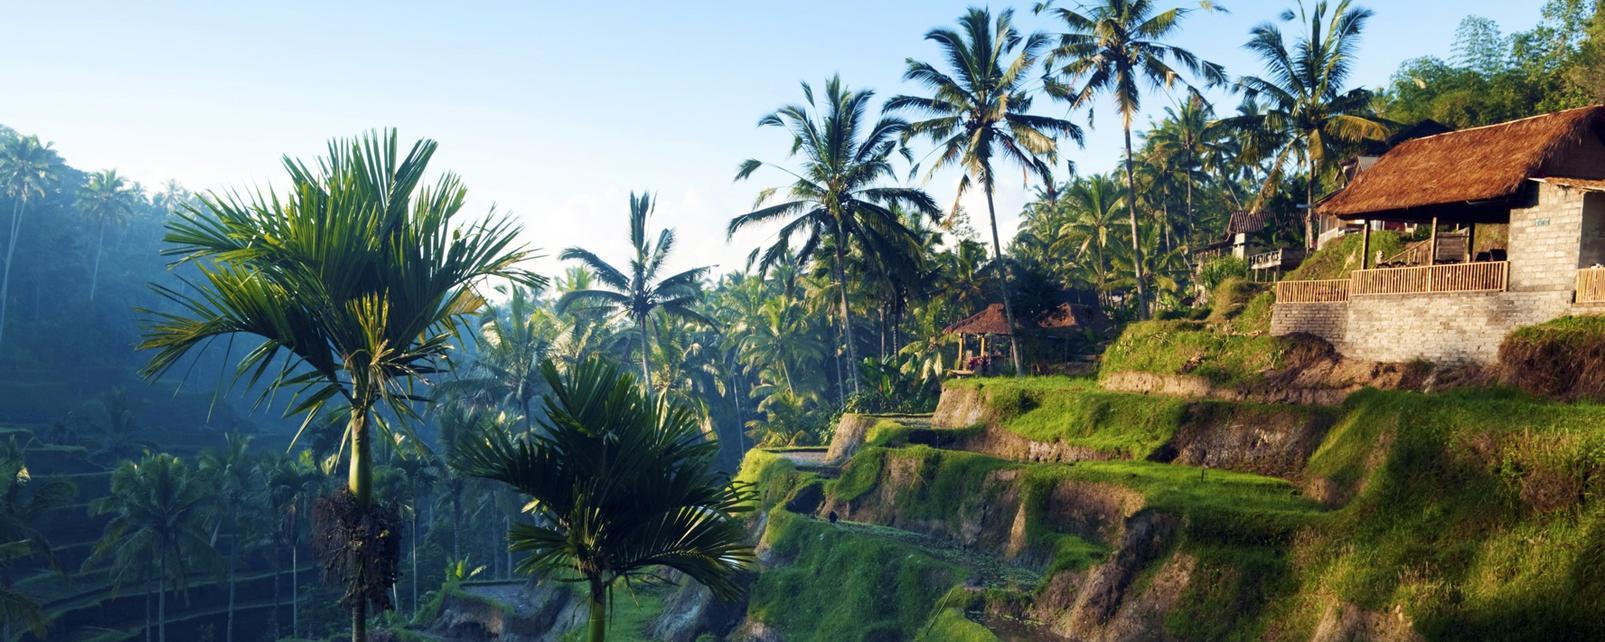 how to travel in ubud